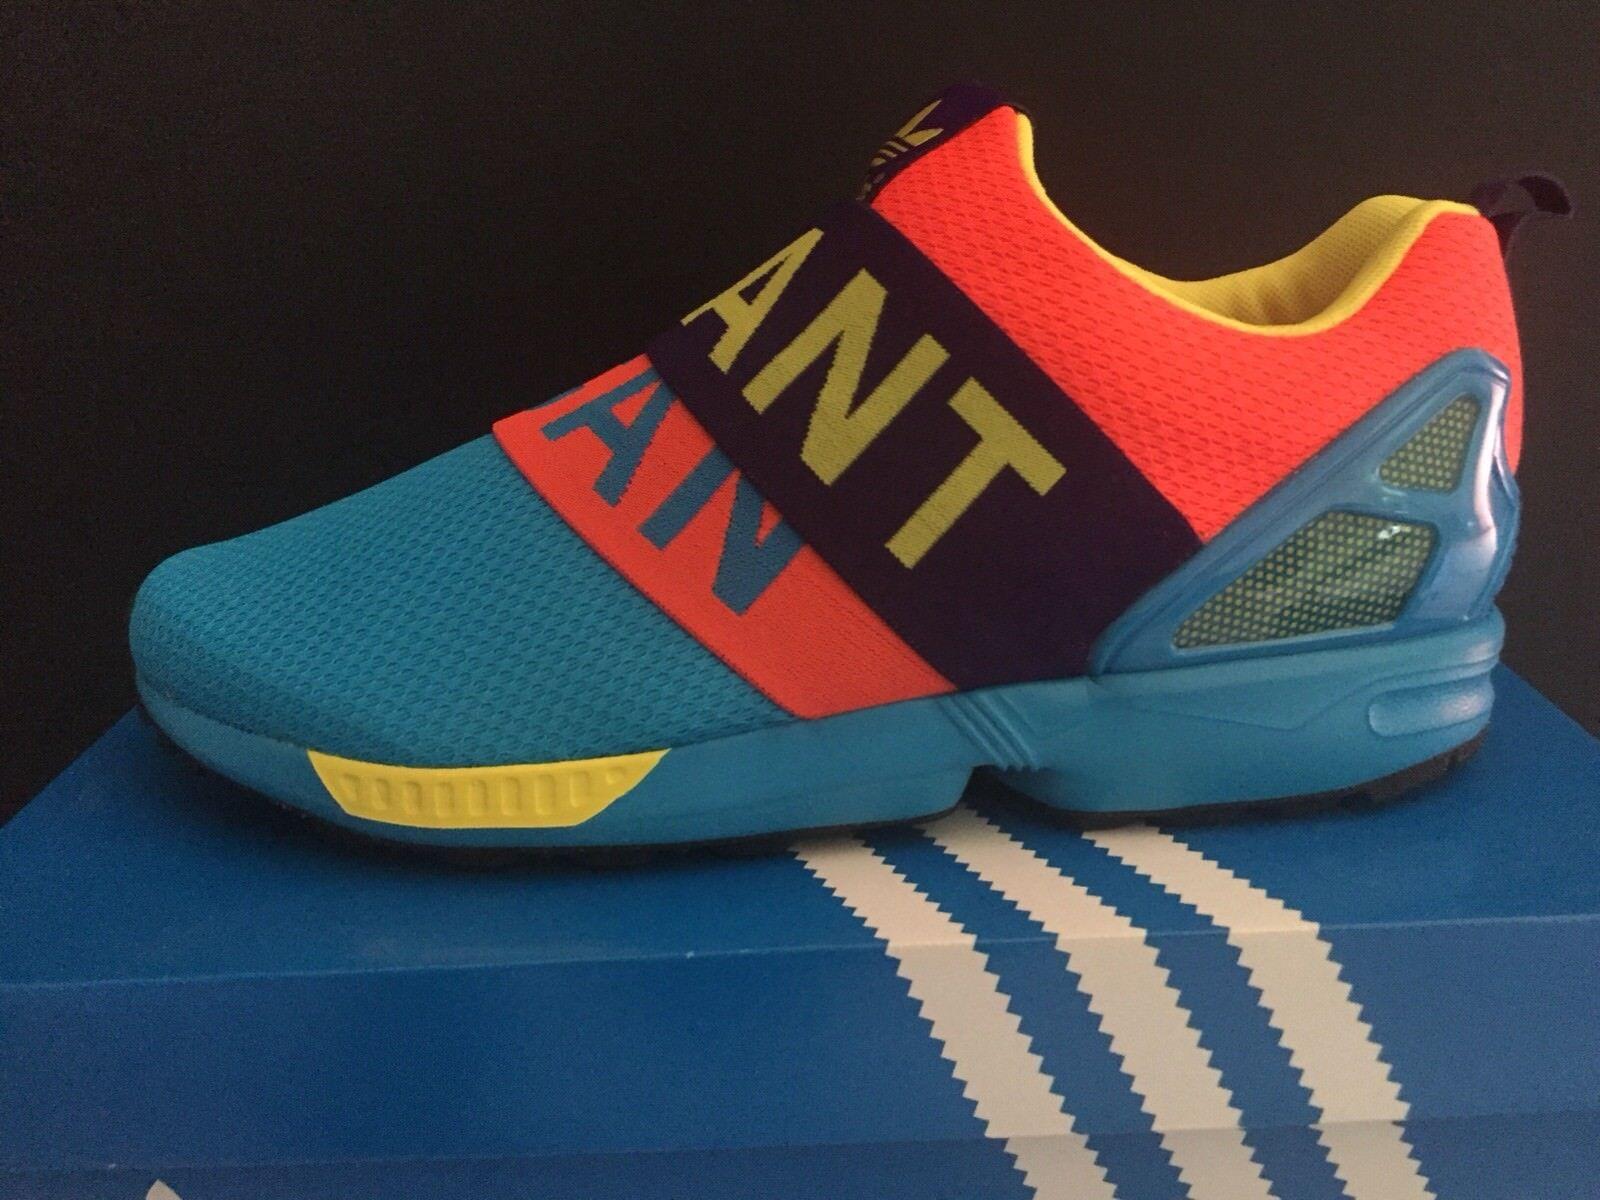 Adidas Zx Flux Slip On Aqua 42 2/3